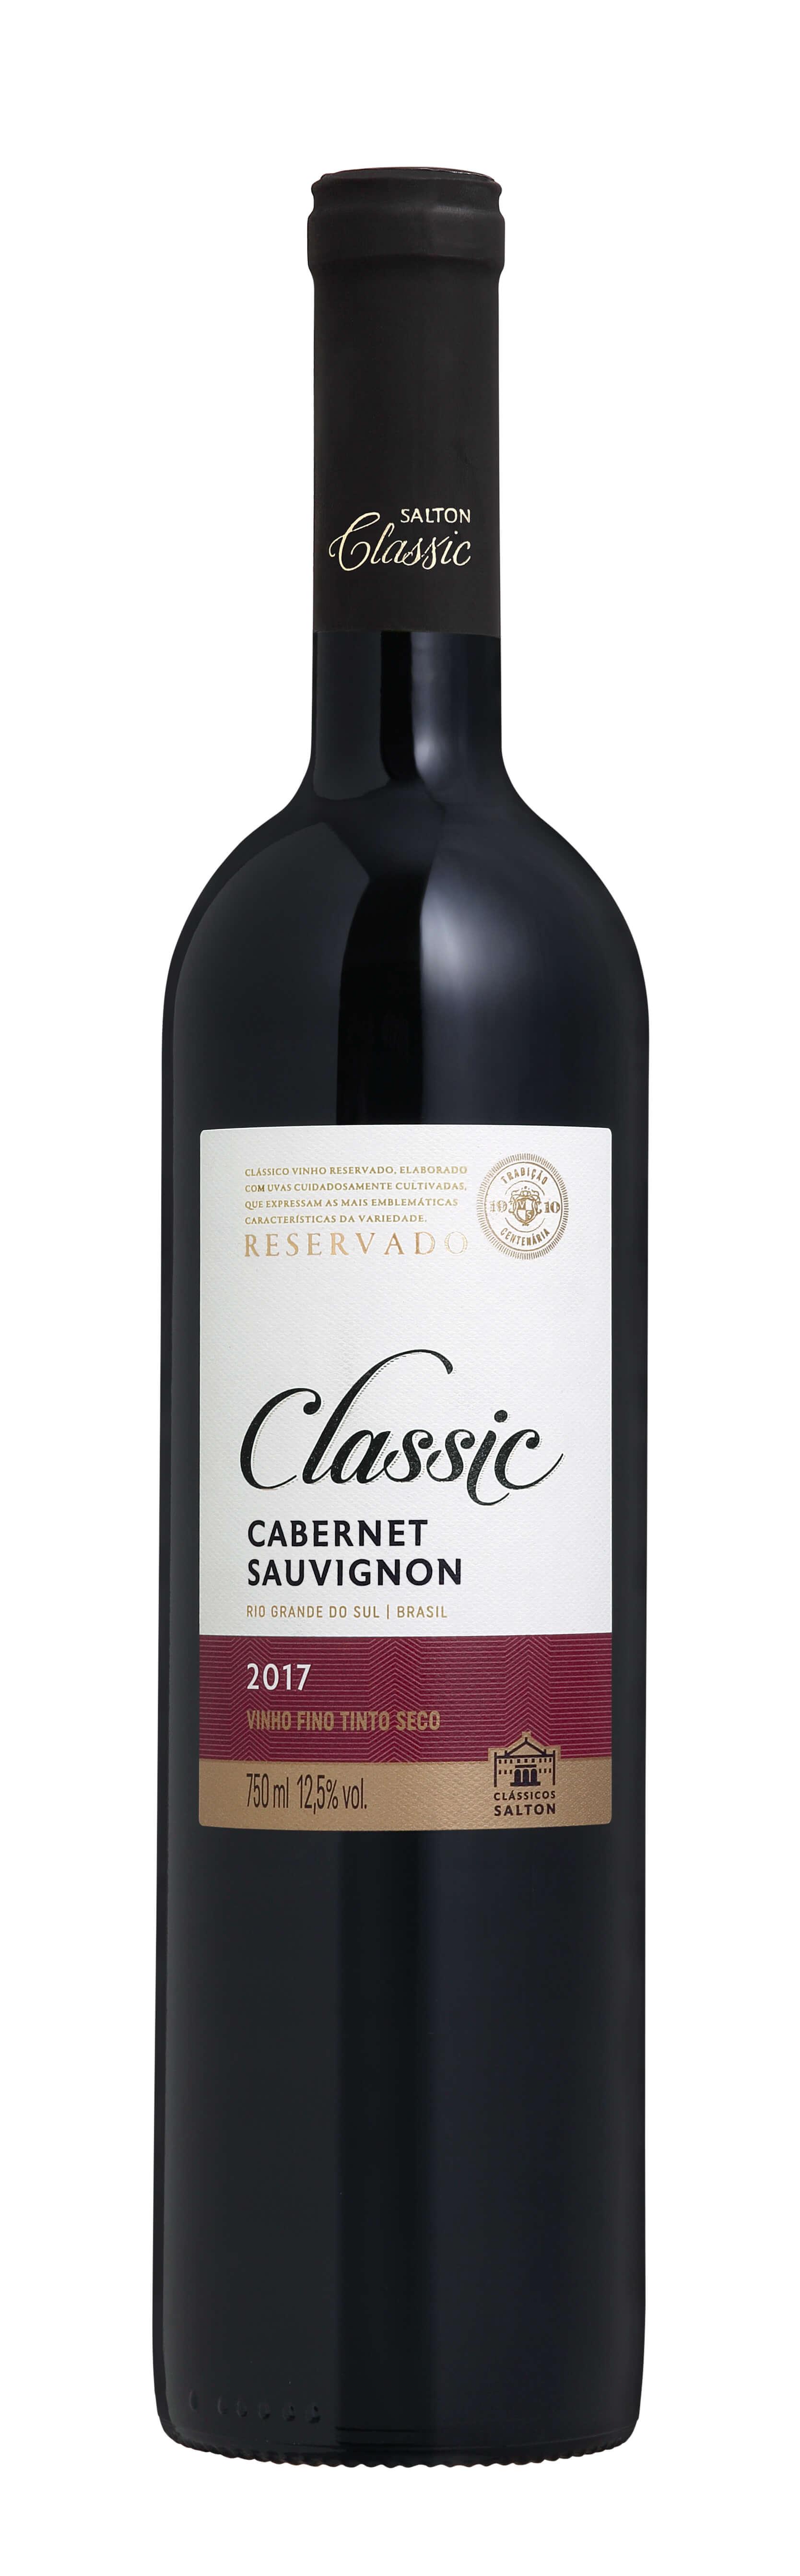 SALTON CLASSIC CABERNET SAUVIGNON